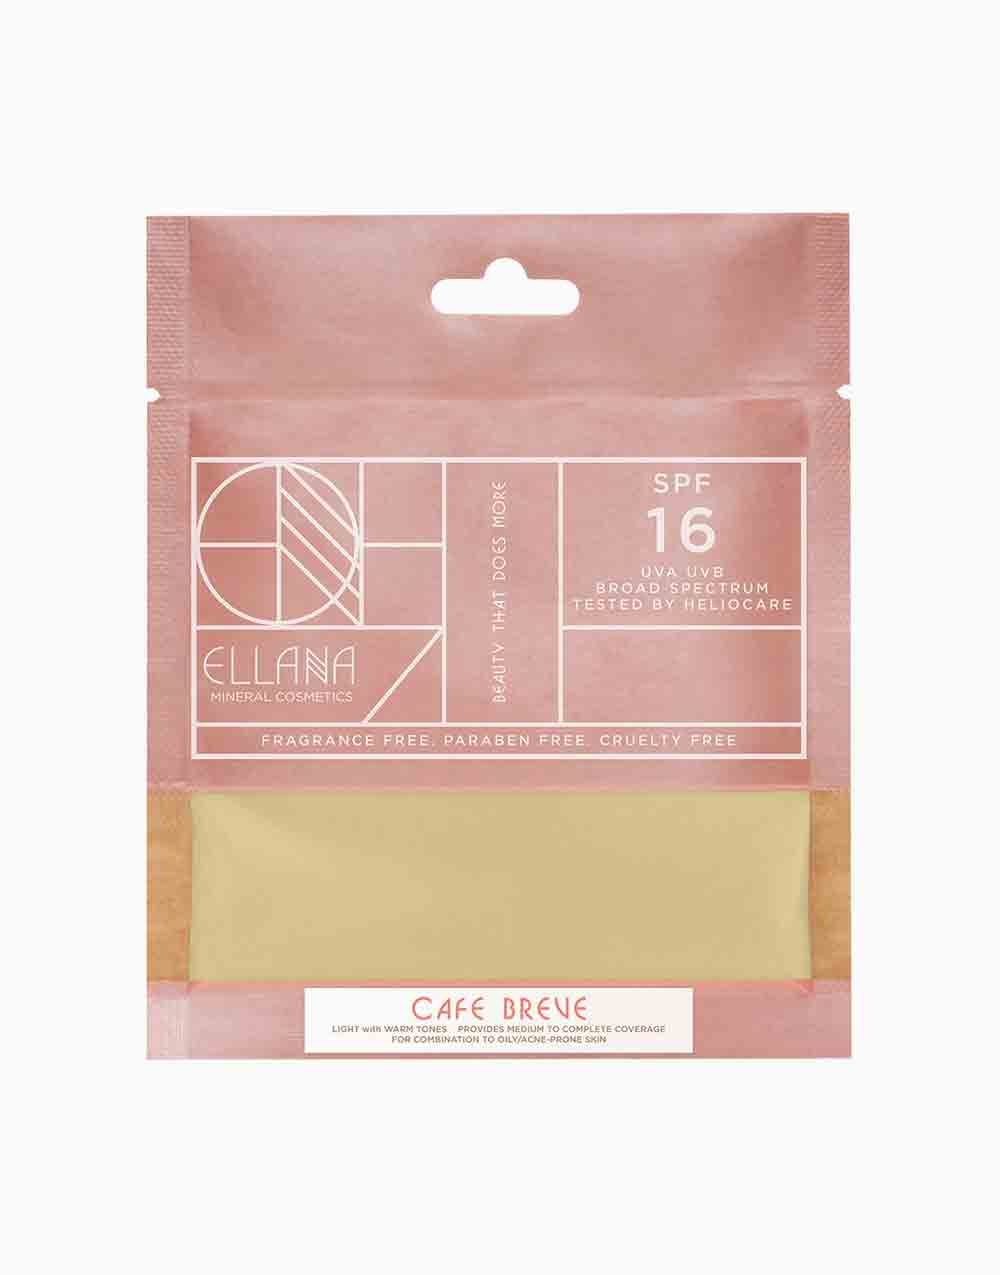 Loose Mineral Foundation Refill by Ellana Mineral Cosmetics   Café Breve